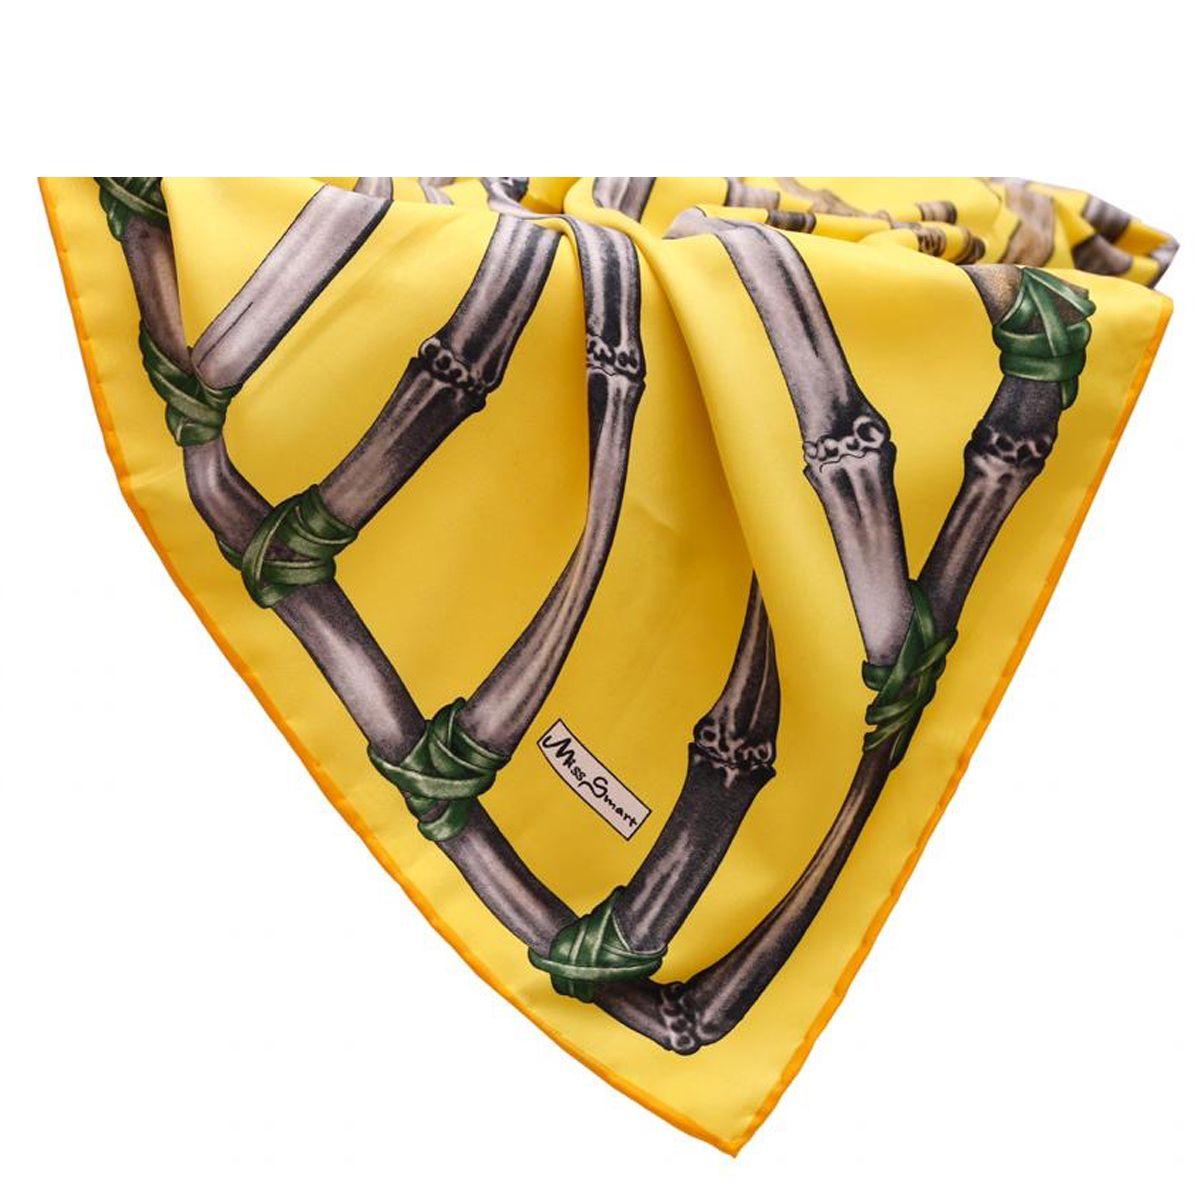 روسری زنانه میس اسمارت کد 9905 -  - 2